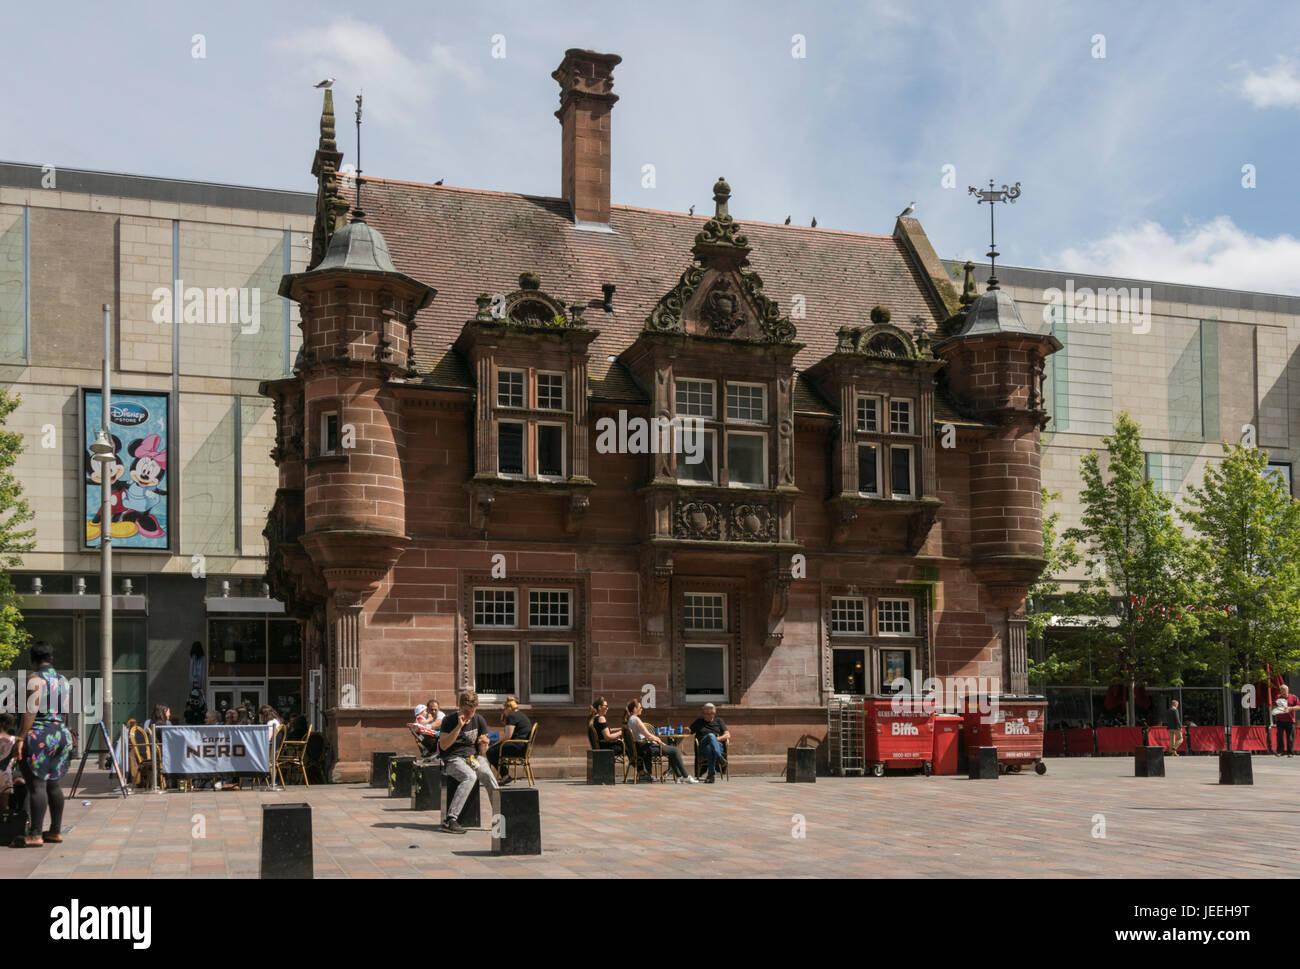 Cafe Nero, ex subway ticket office, St Enoch square, Glasgow, Scotland, United Kingdom, - Stock Image